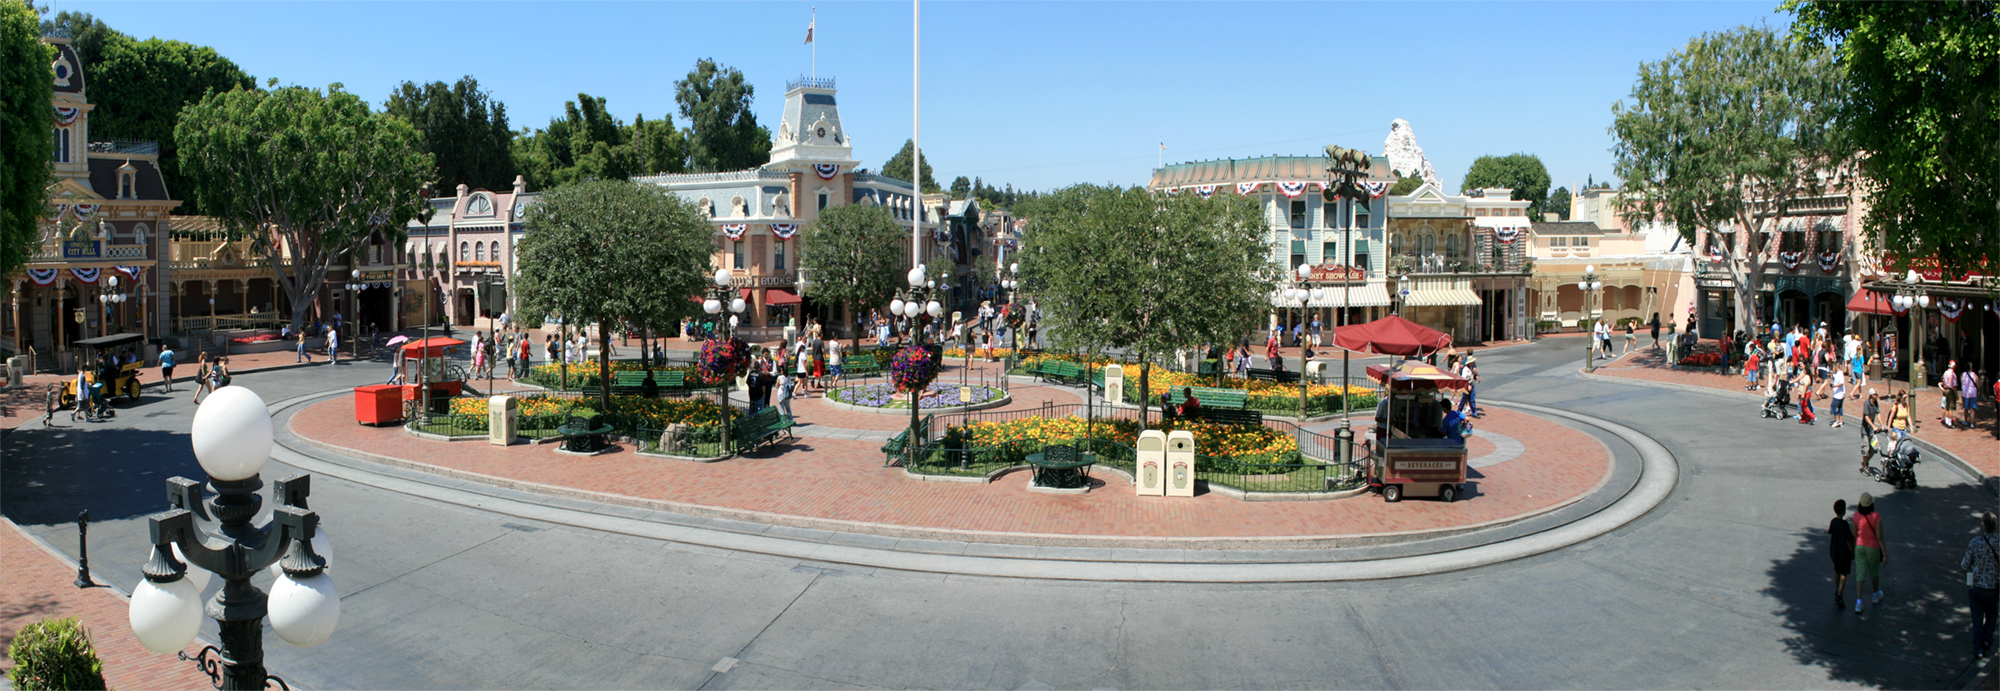 Town Square, Disneyland, 2007.